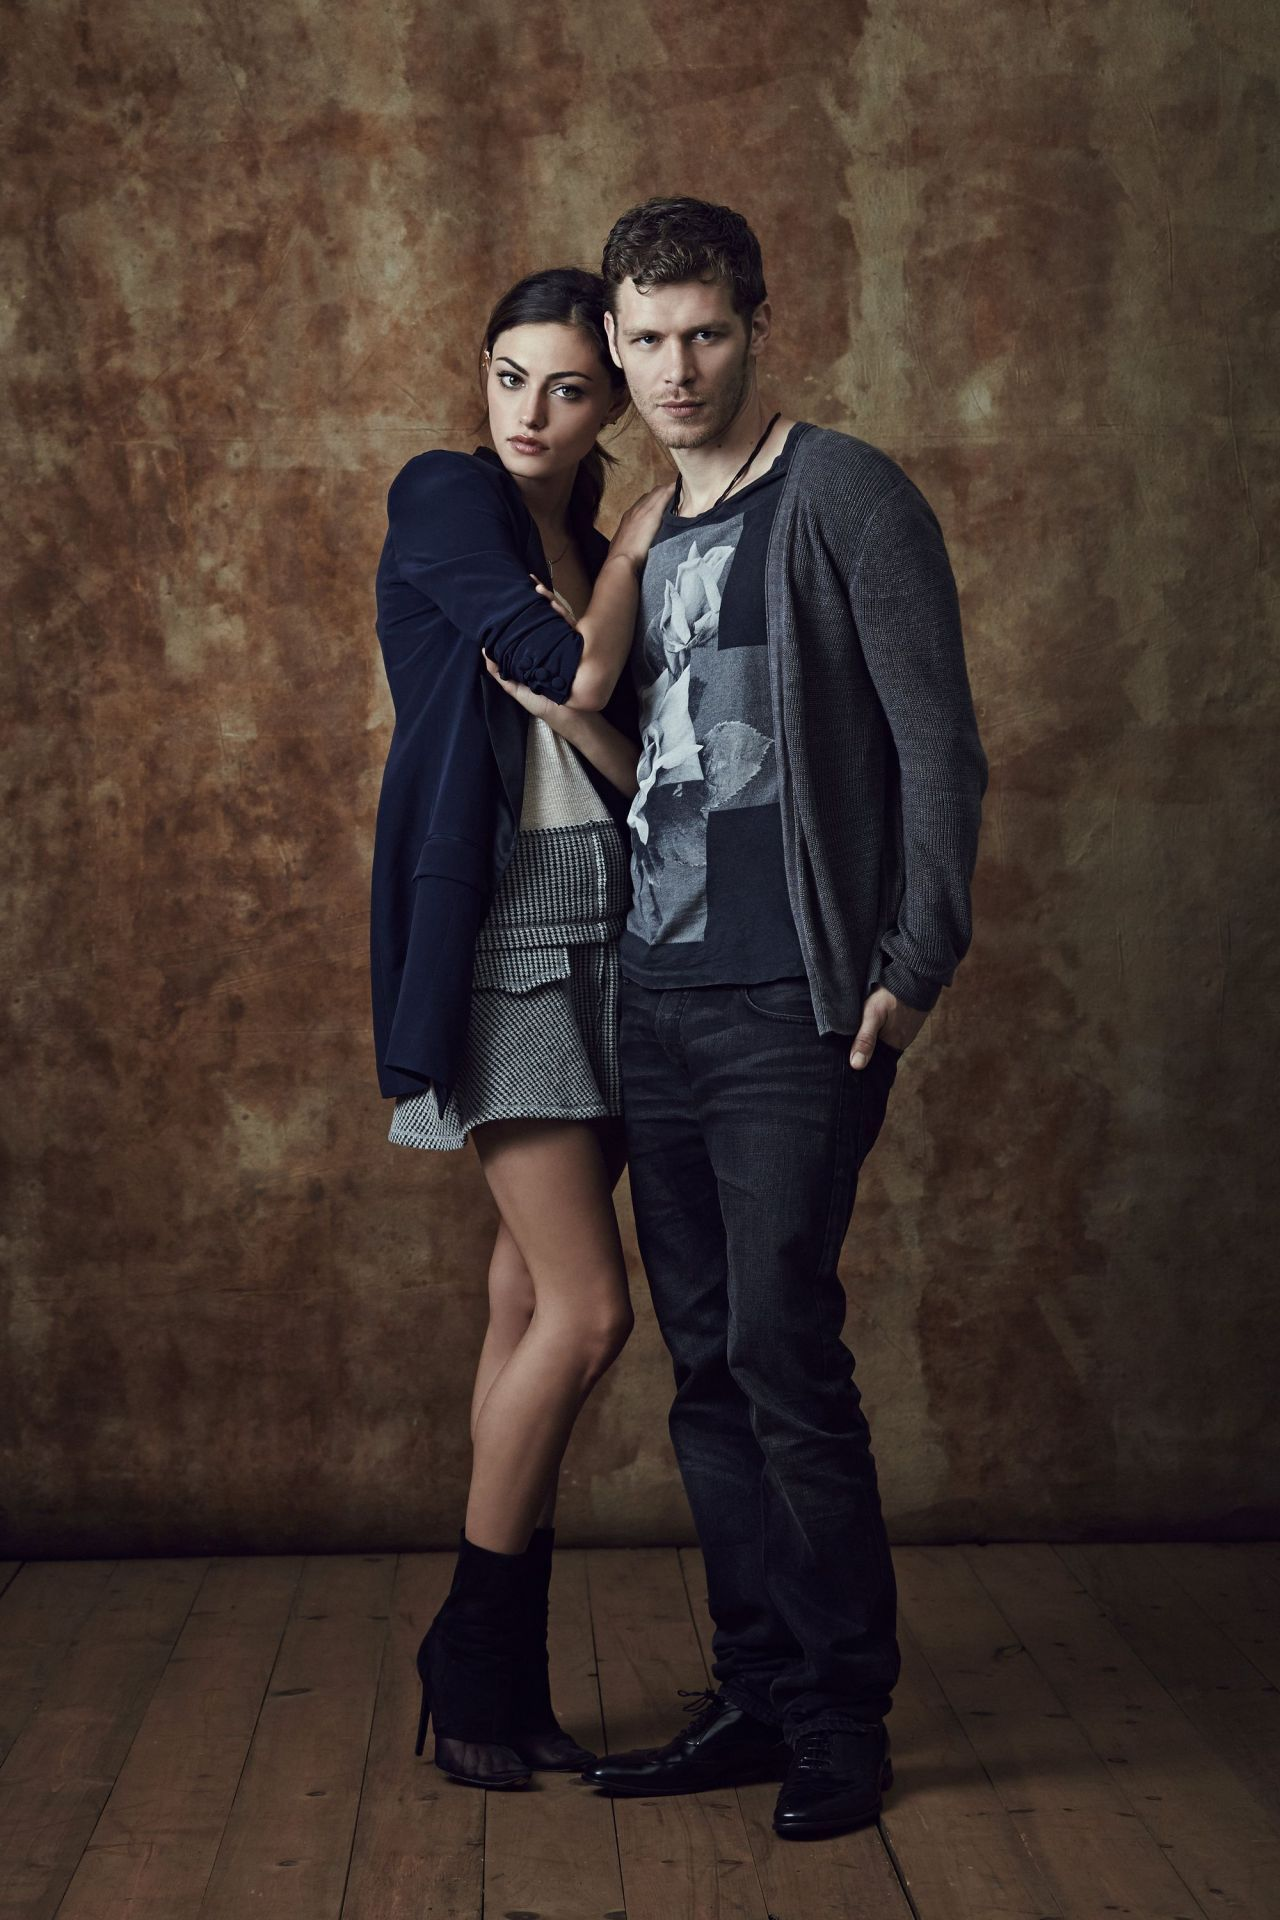 Joseph Morgan & Phoebe Tonkin